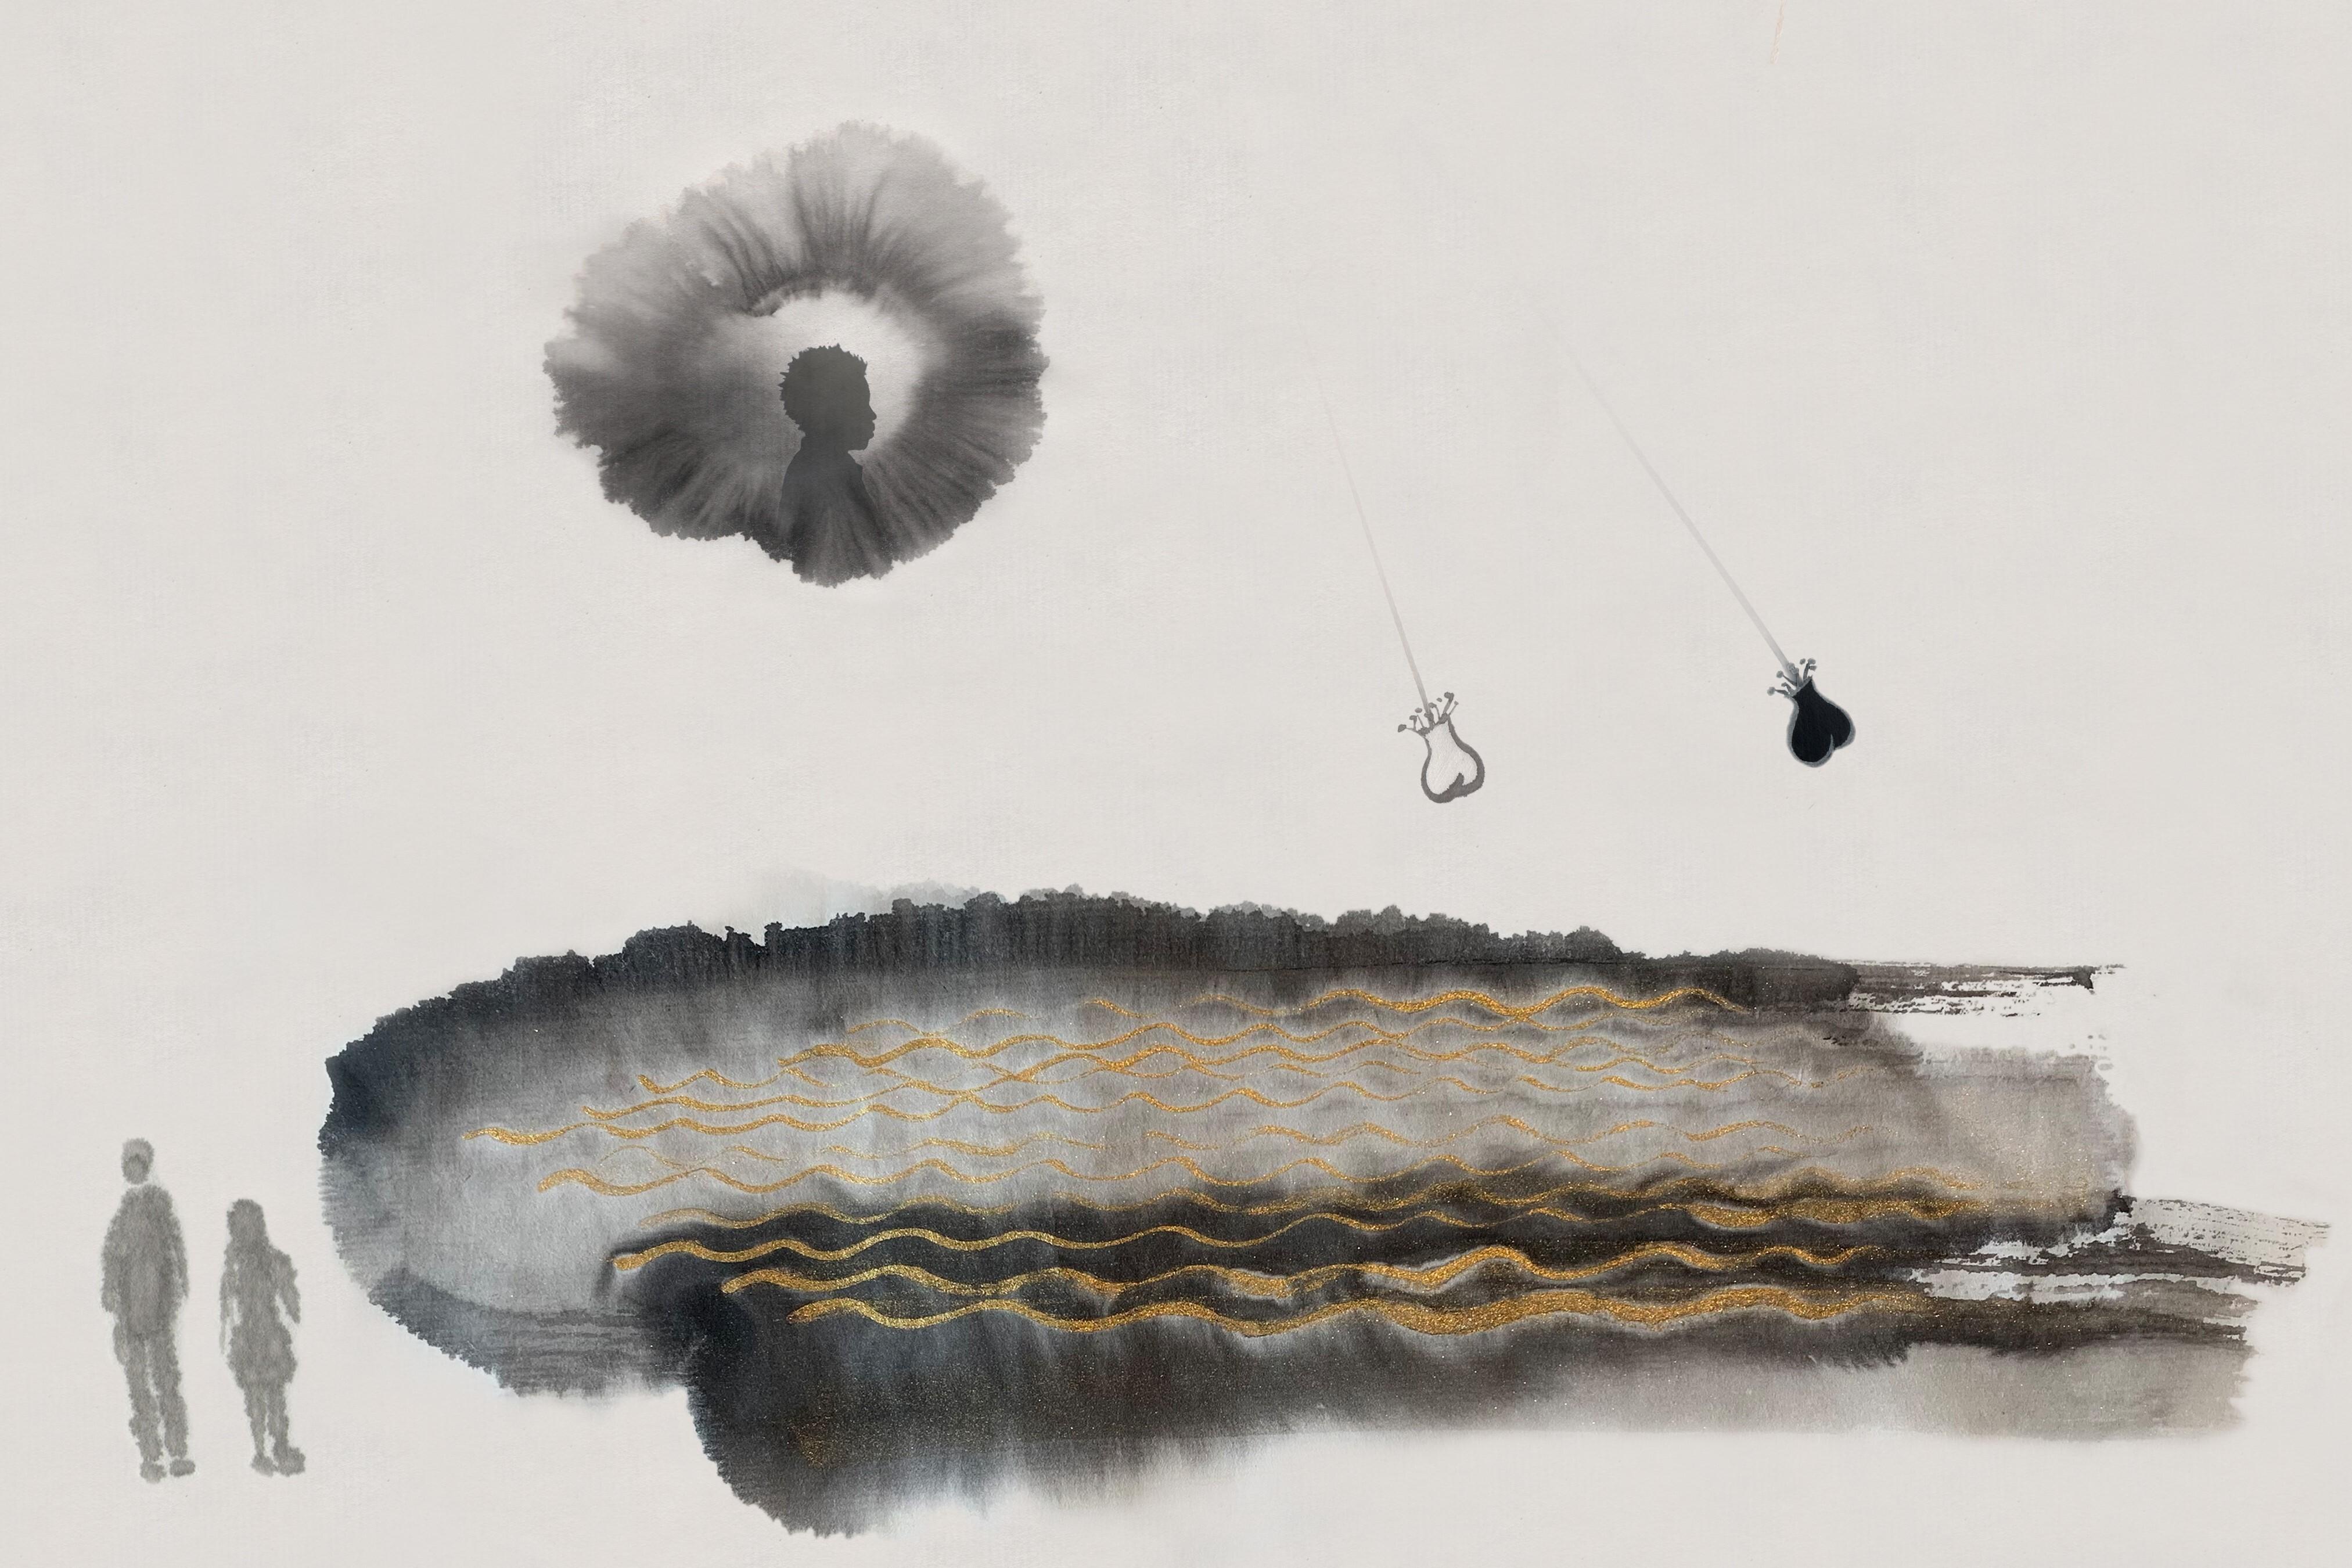 Jennifer Wen Ma, Rendering of <i>An Inward Sea</i>, 2020